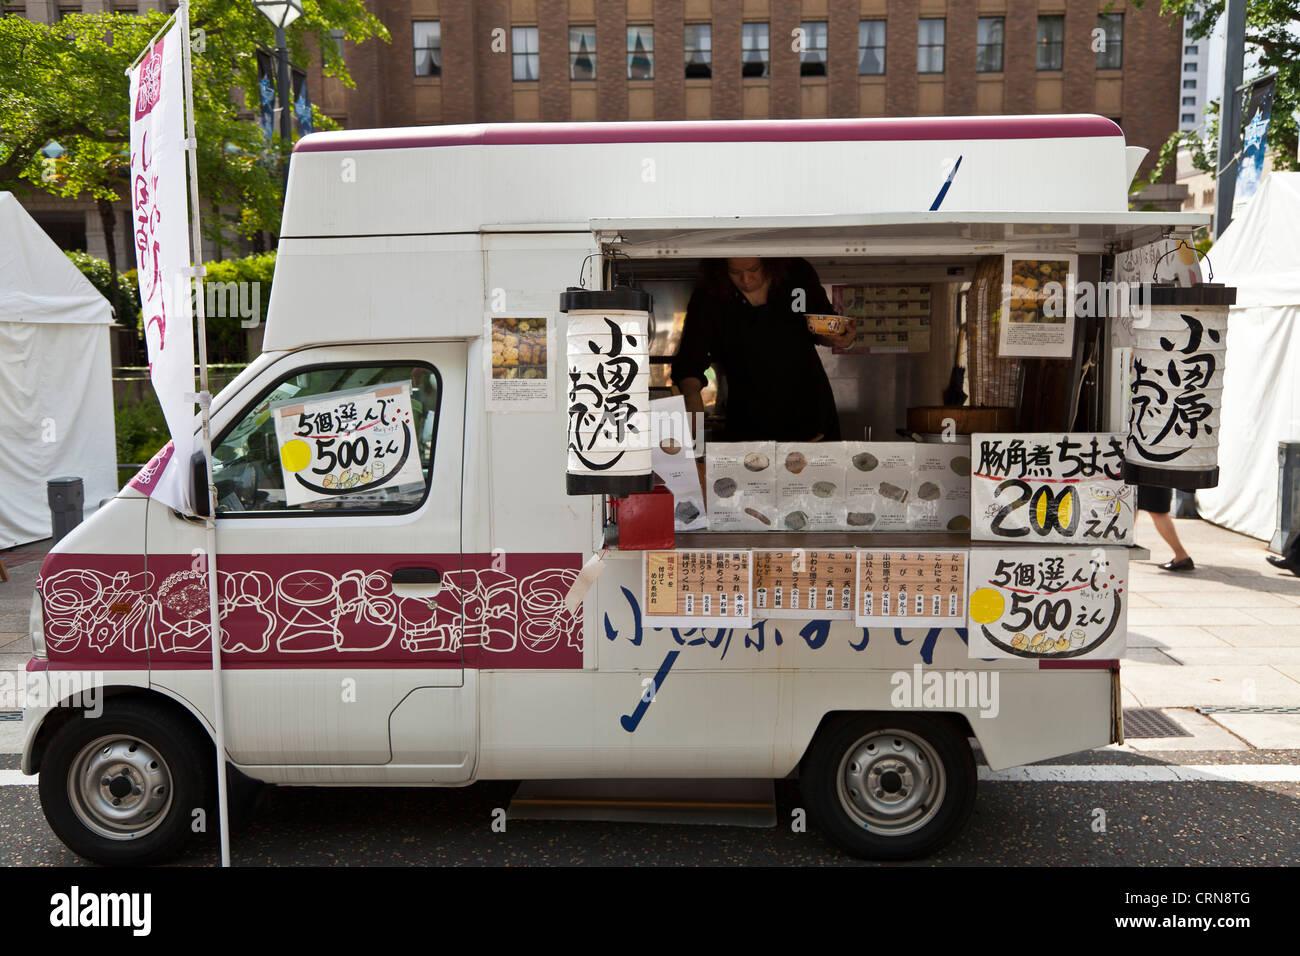 A mobile street vendor at Yokohama, Japan. - Stock Image